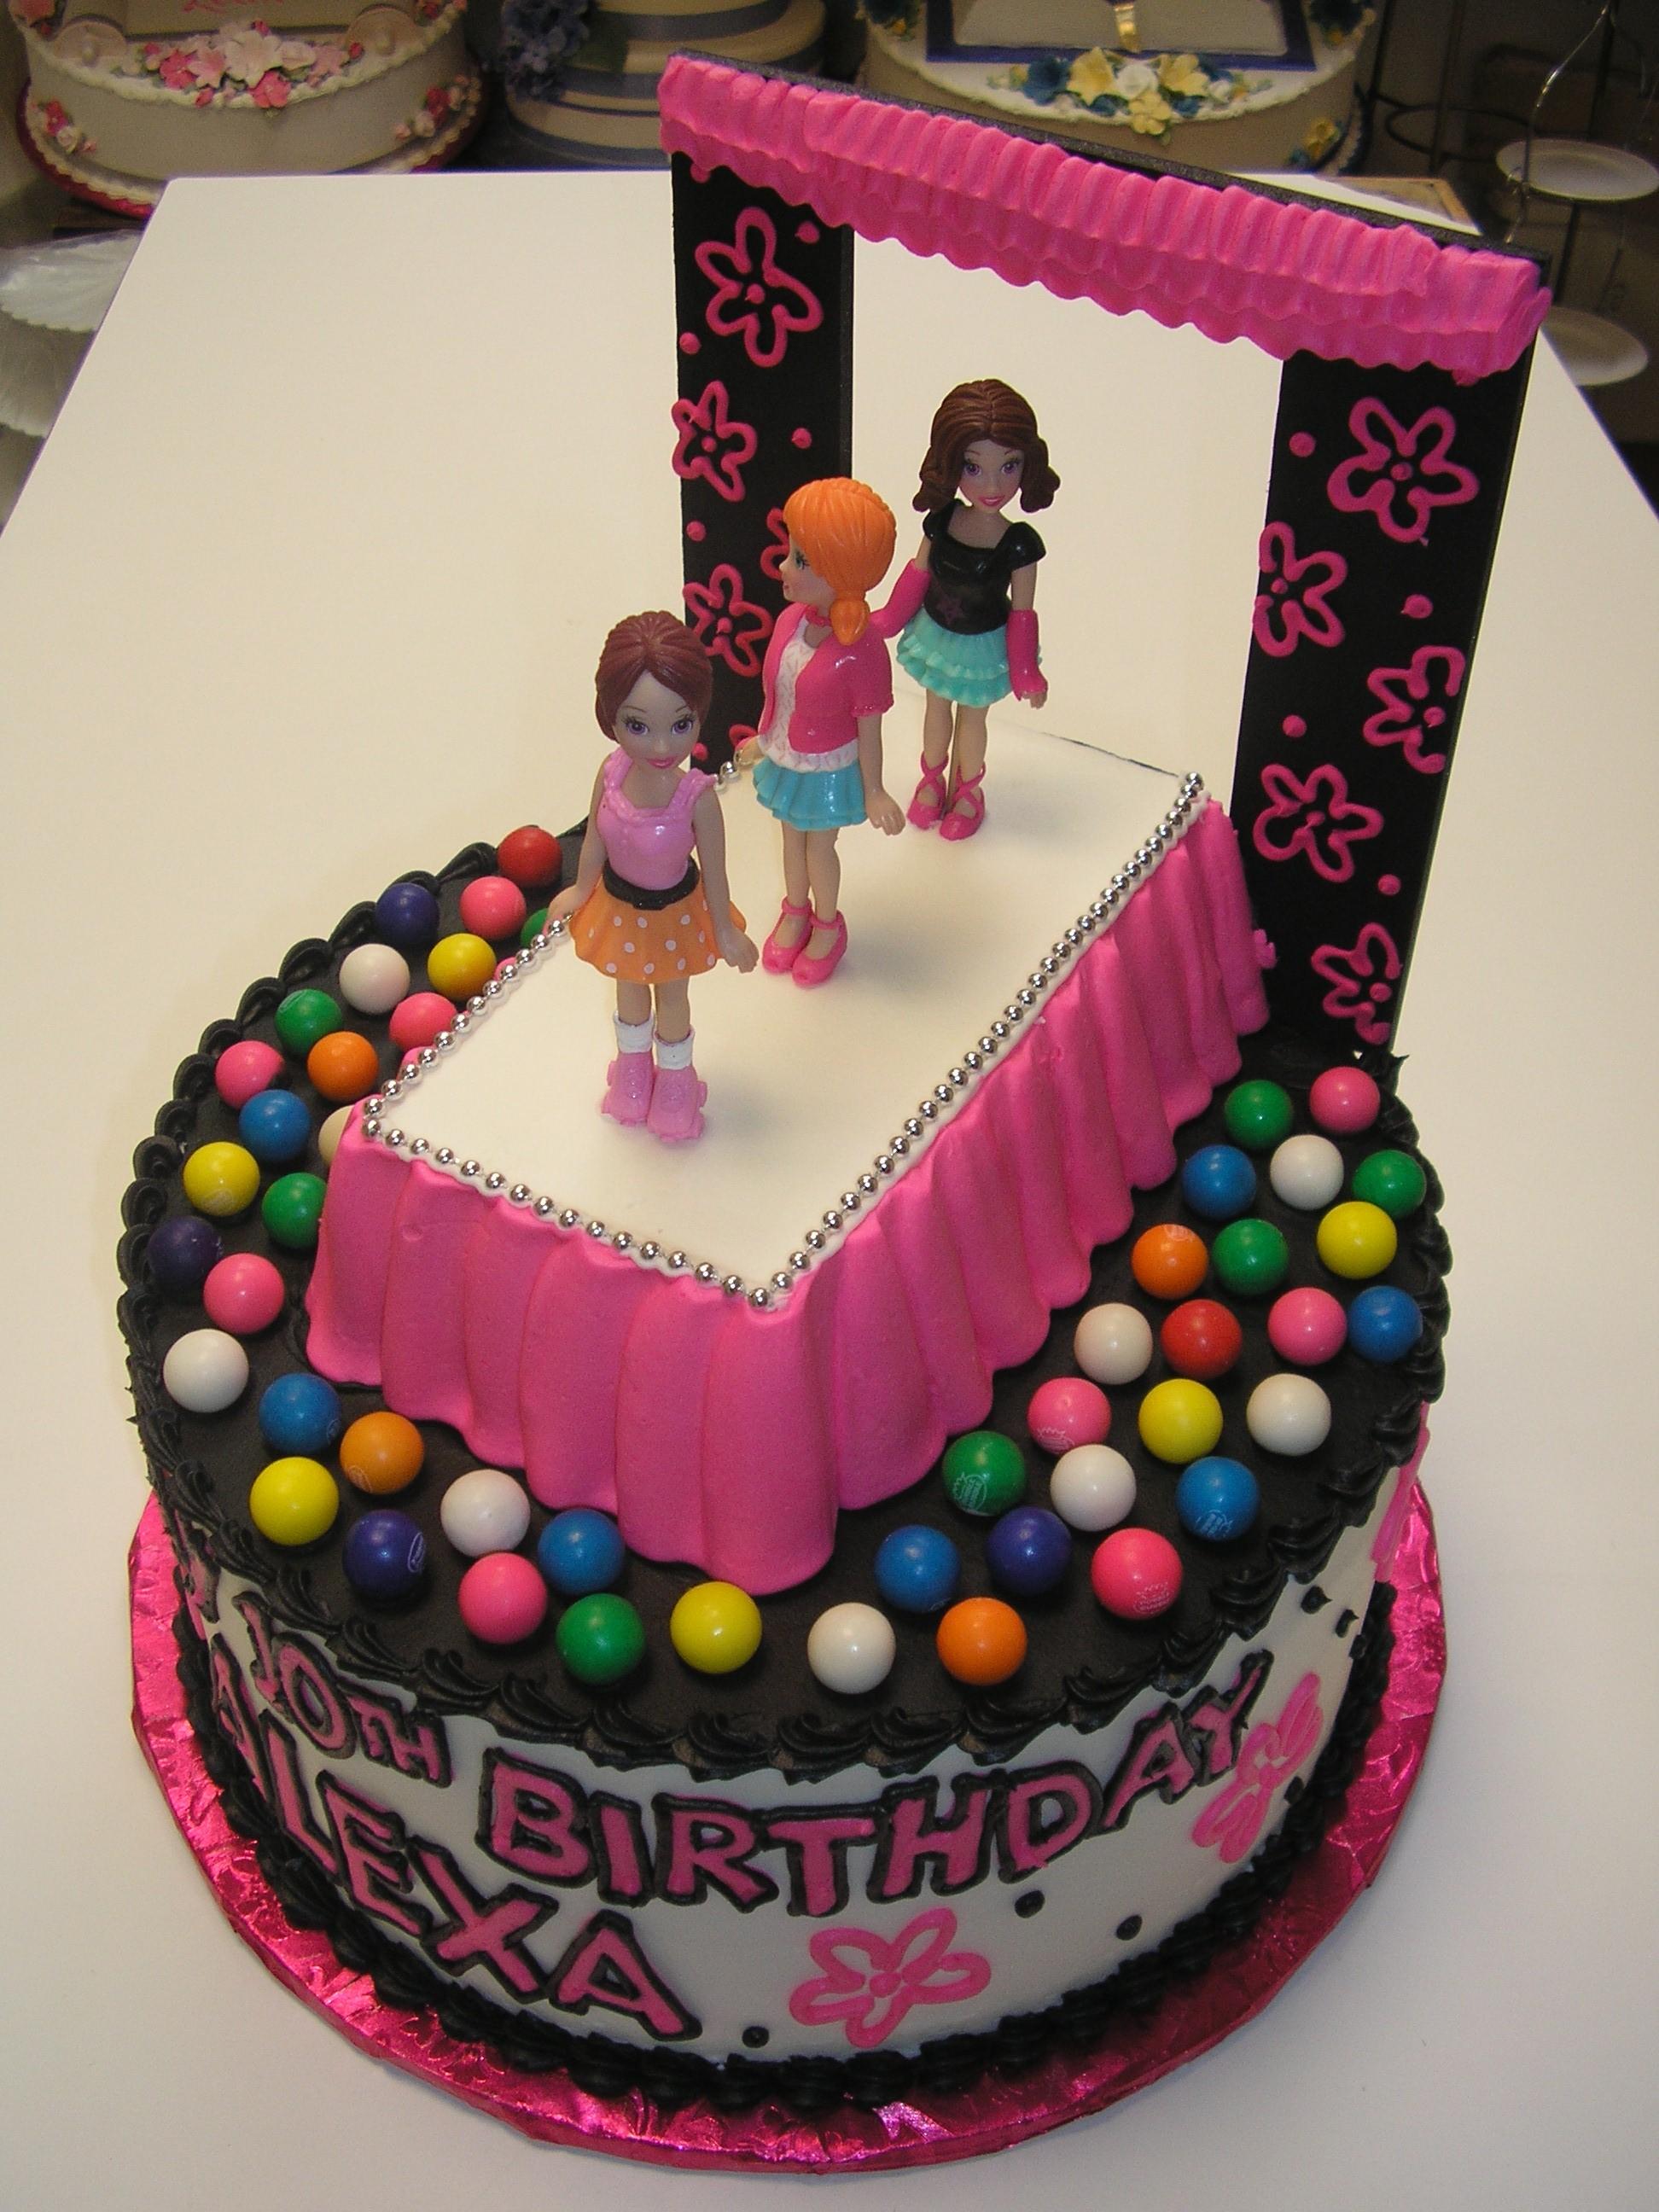 3D fashion show on a cake